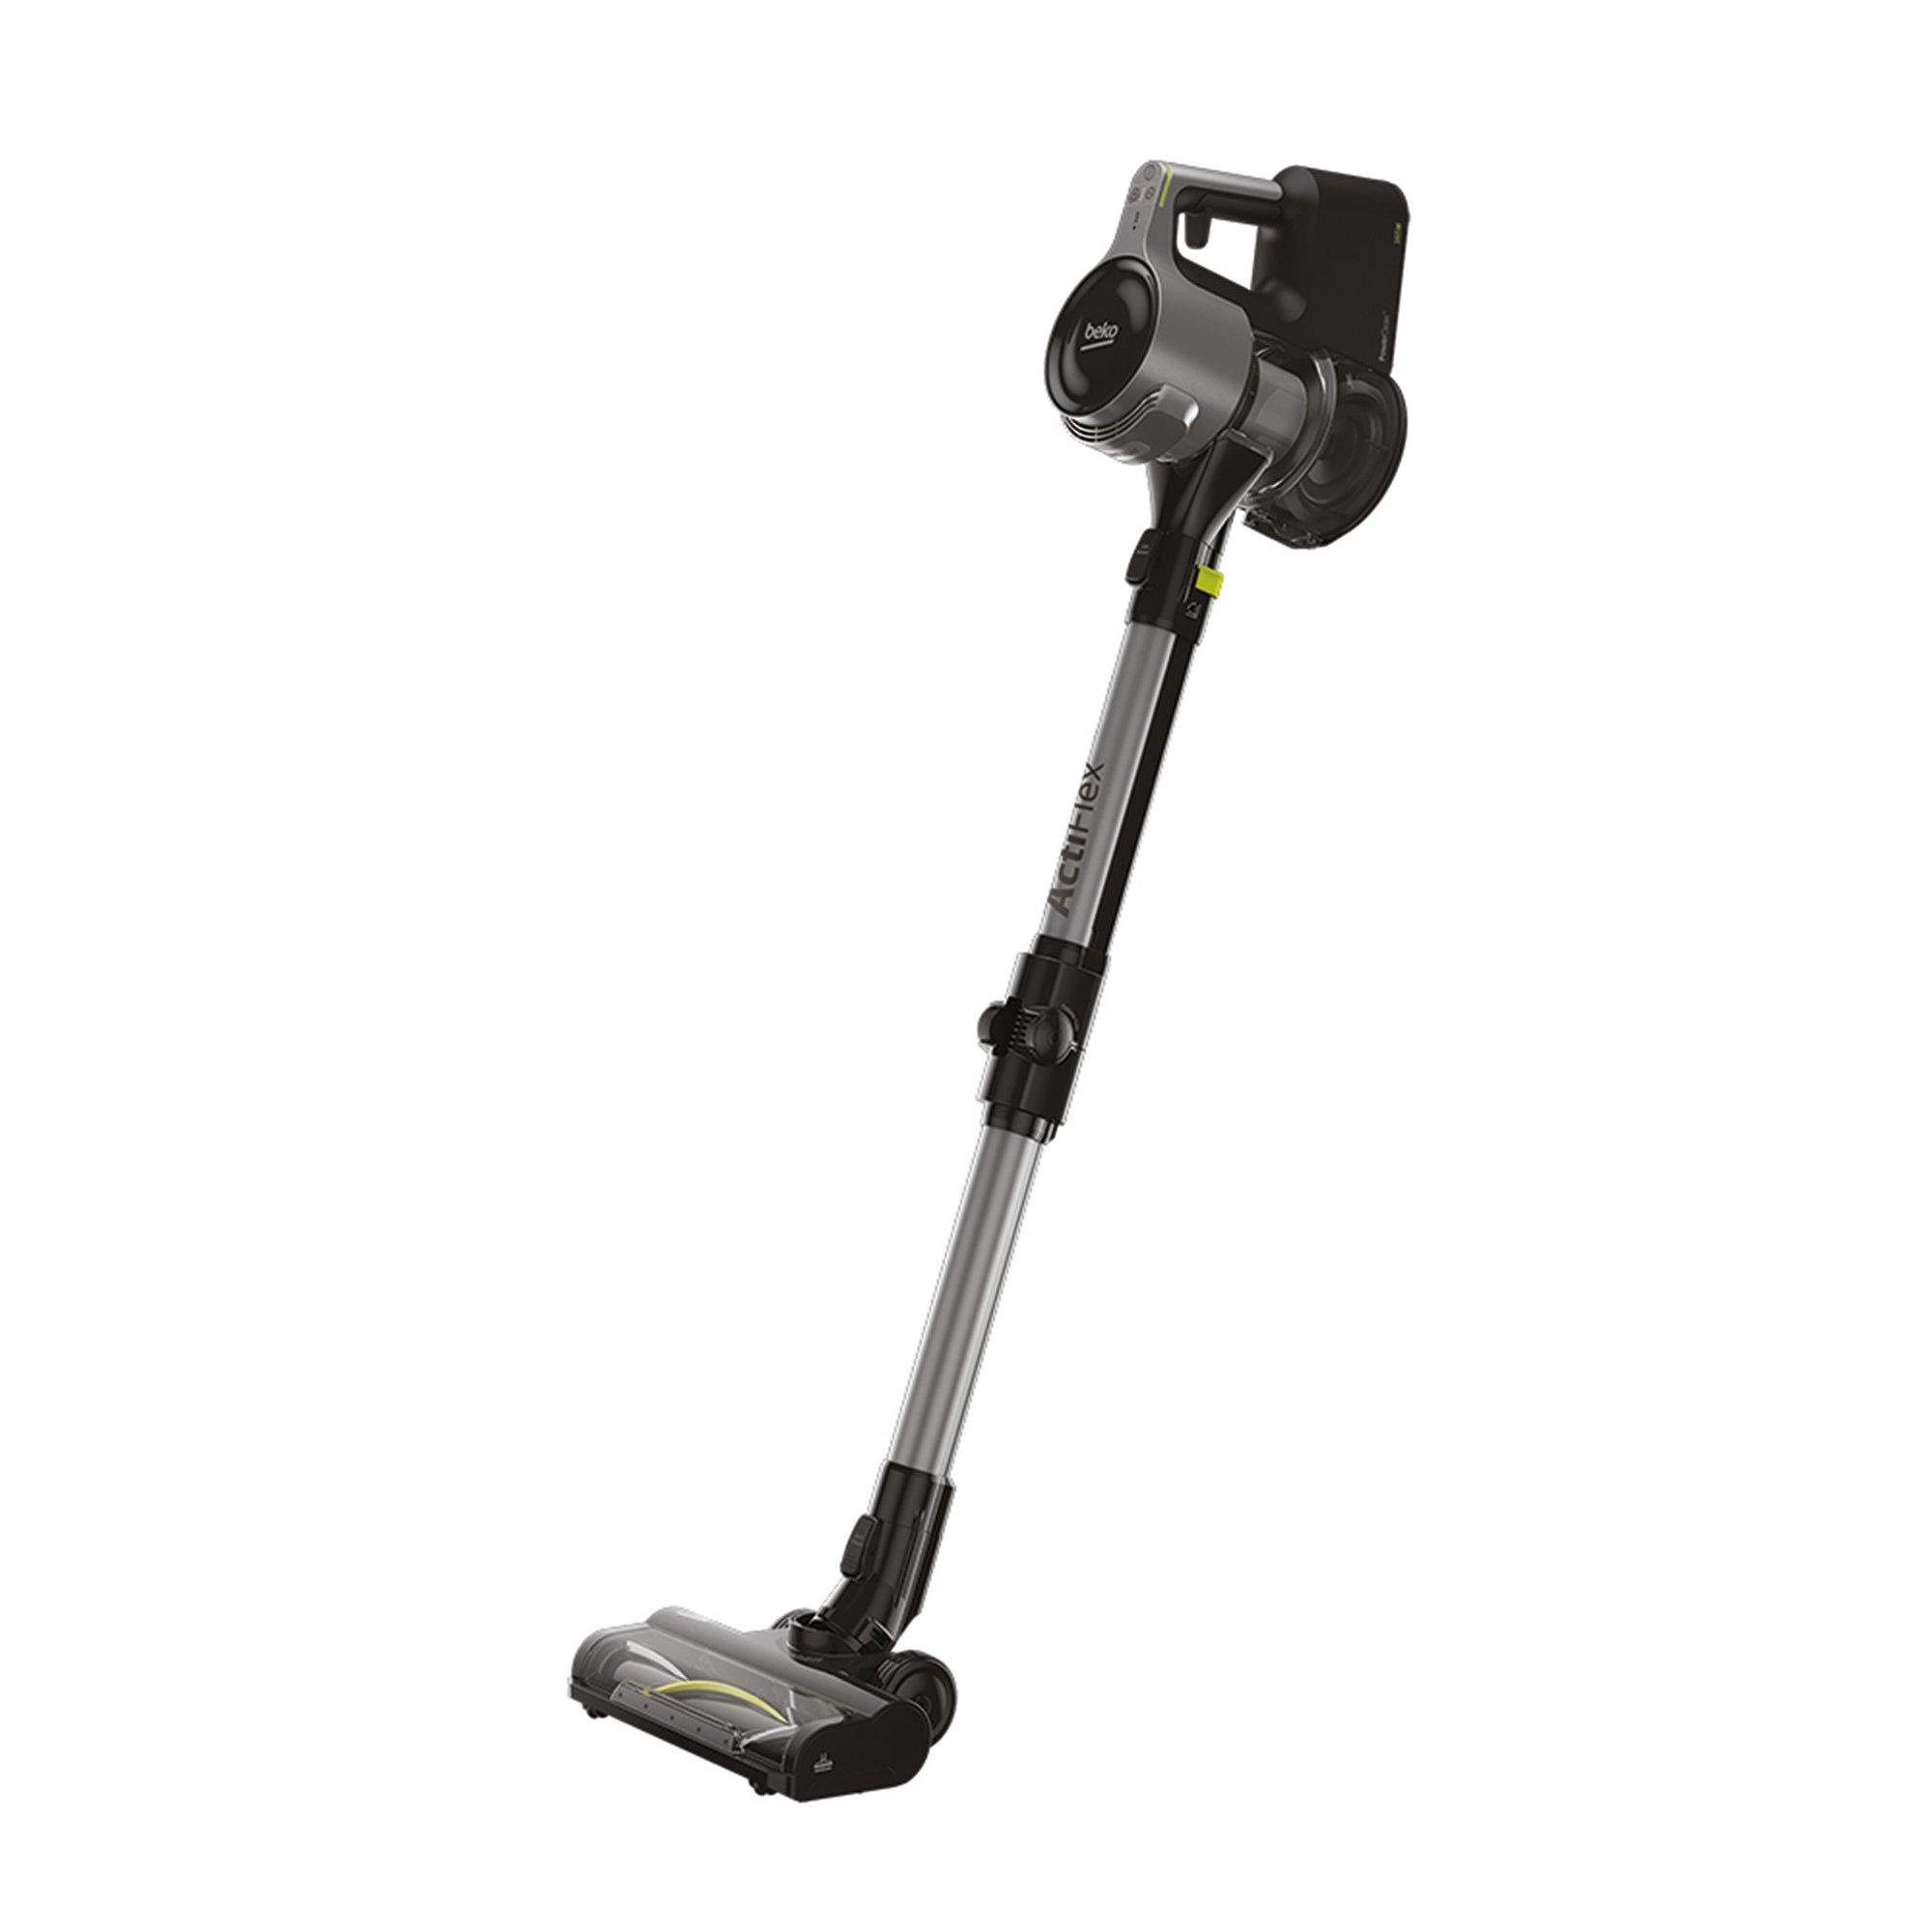 Image of Beko Powerclean Superior Cordless Vacuum Cleaner